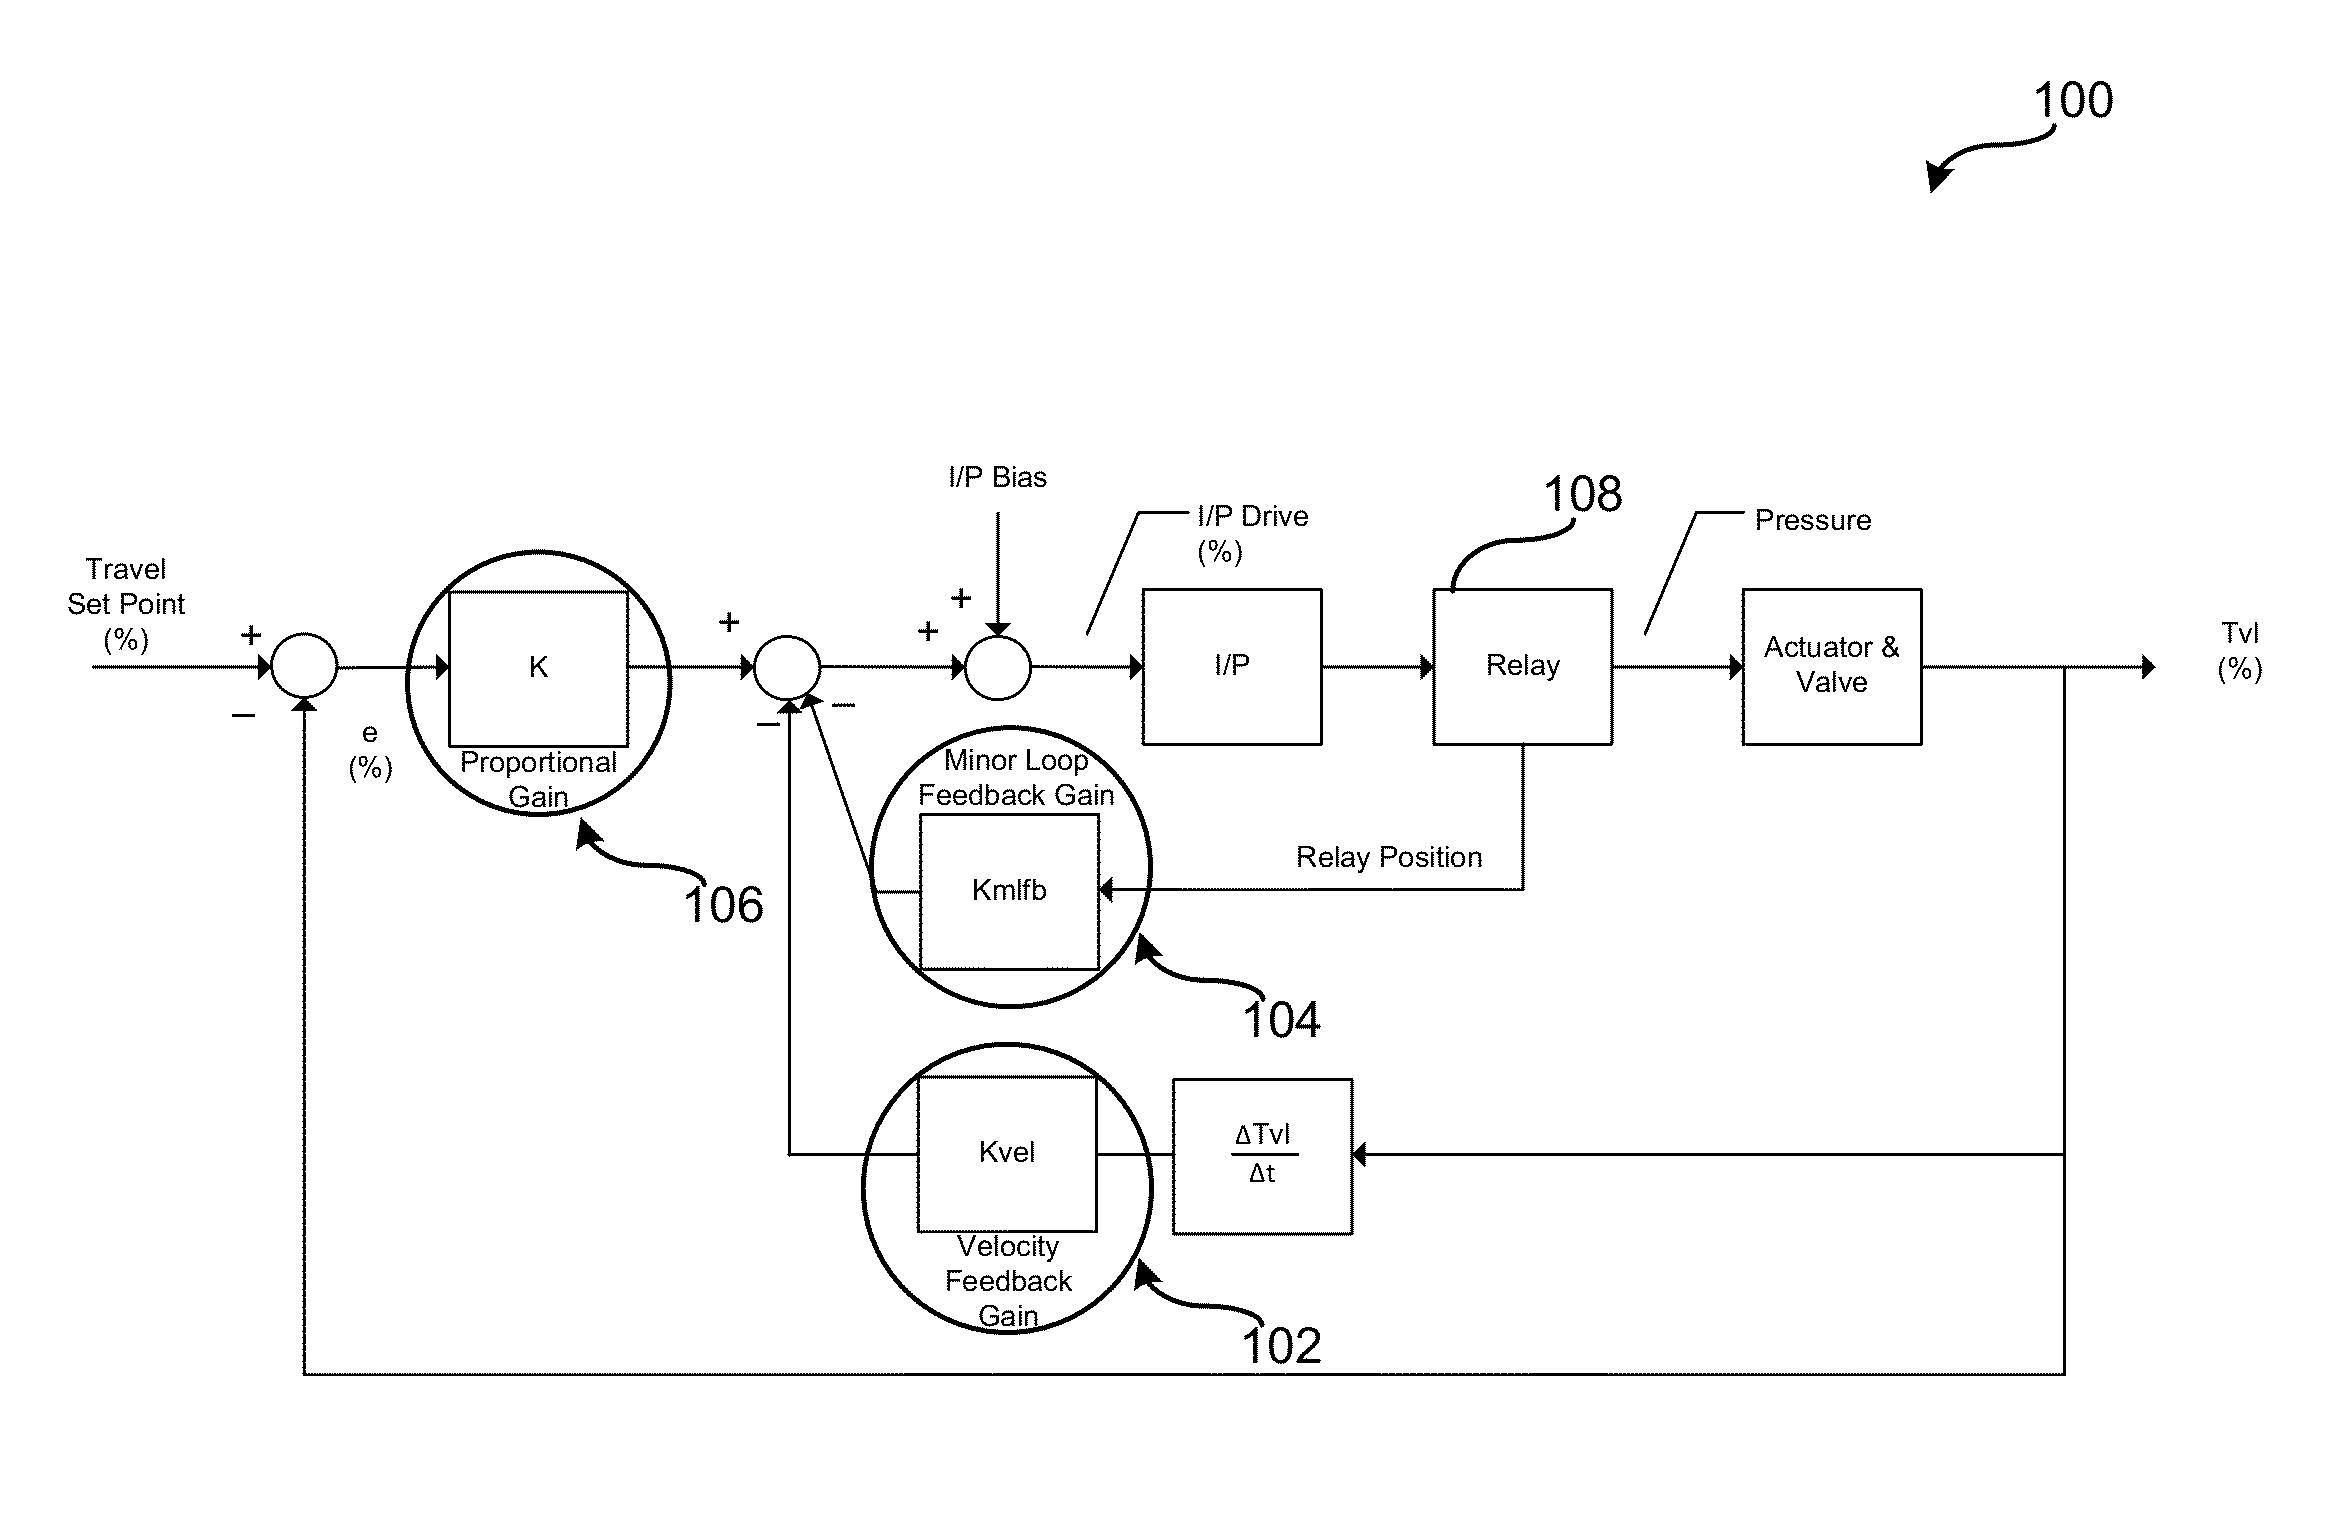 asv rc 50 wiring diagram wiring library rh 84 subluxation com de